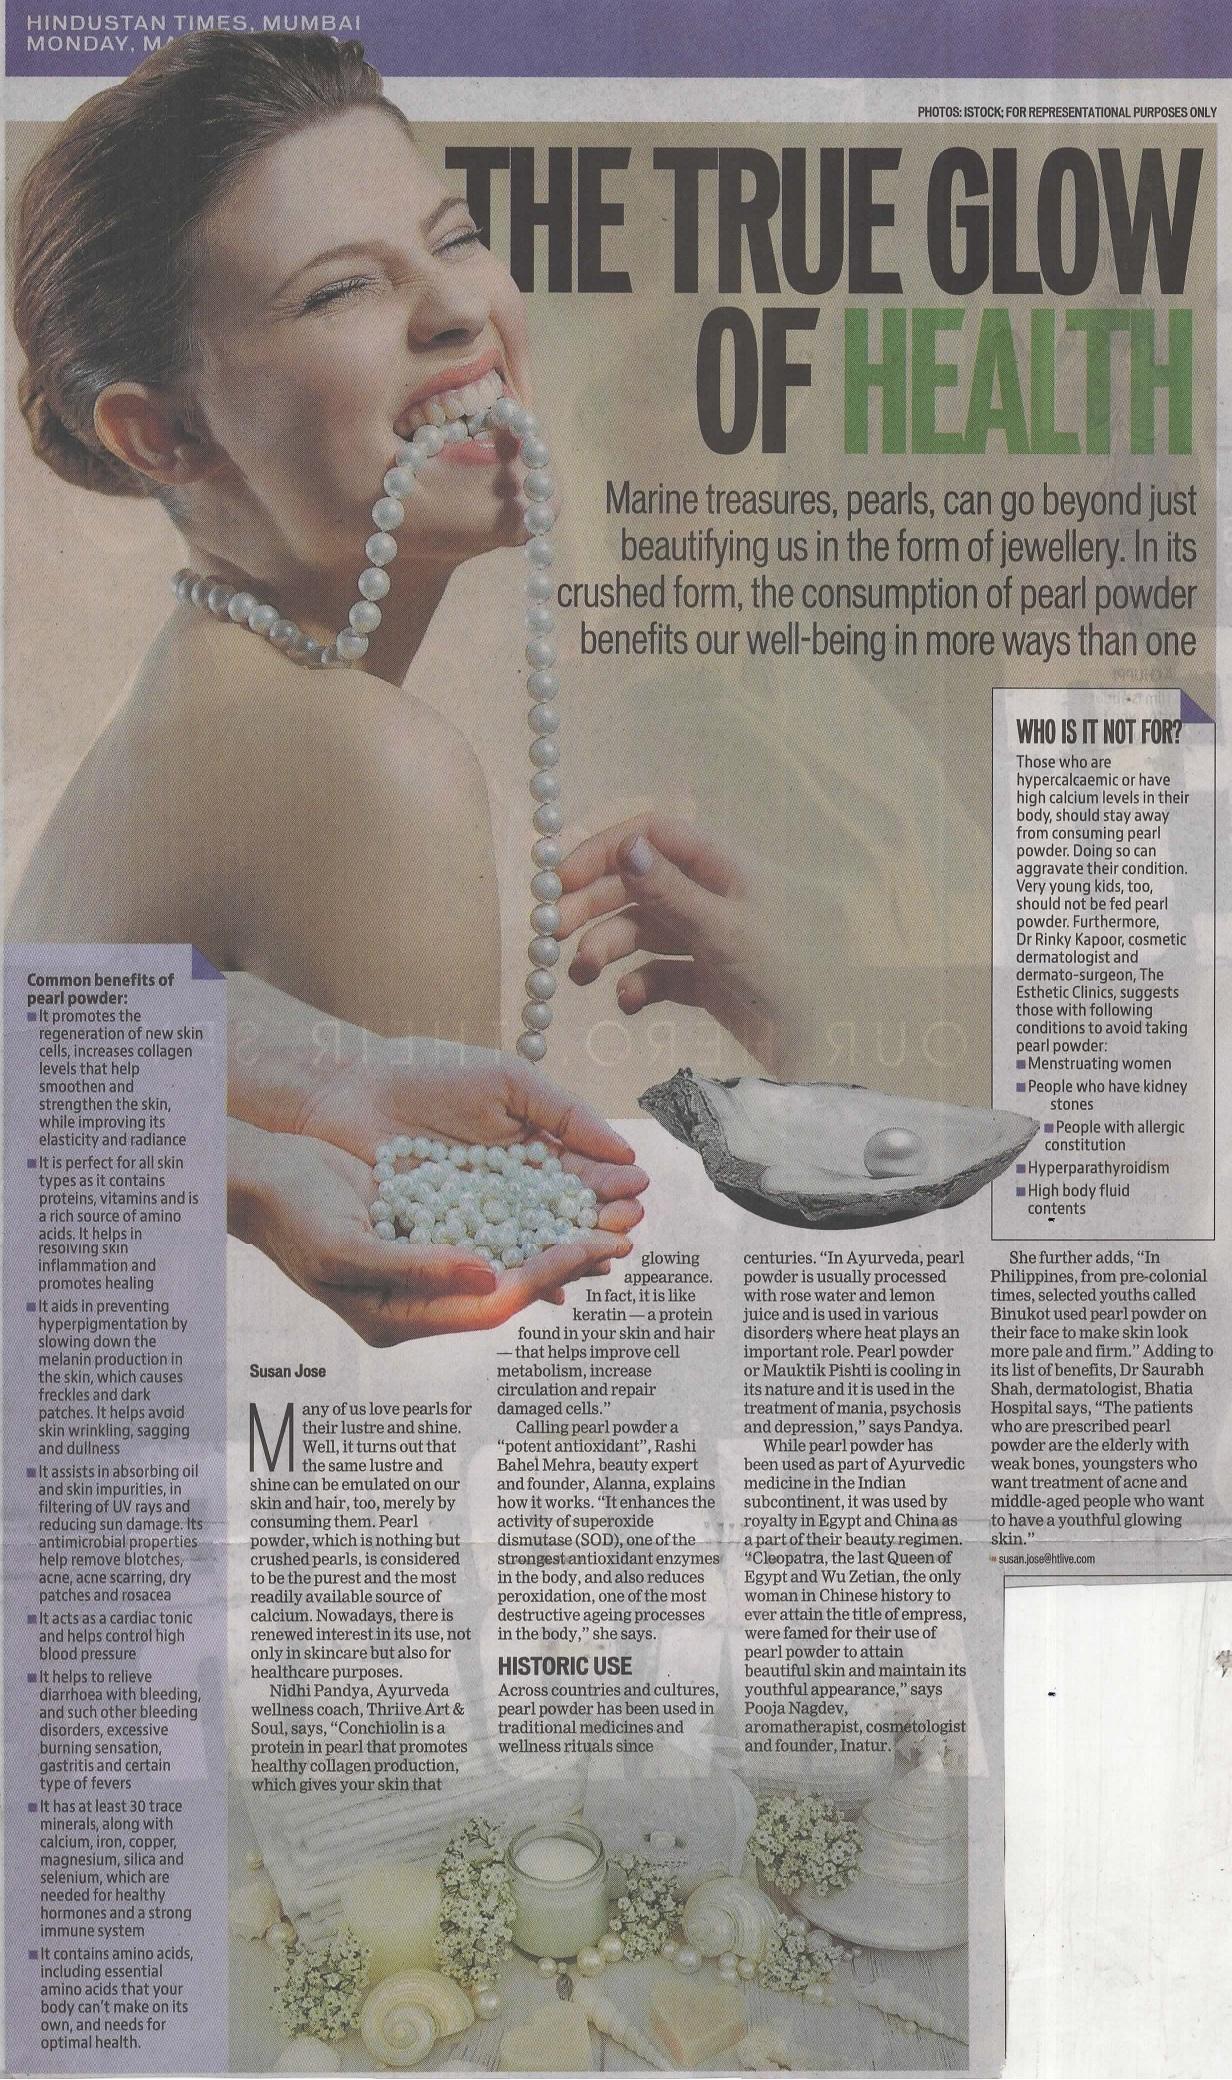 The True Glow Of Health - Hindustan Times